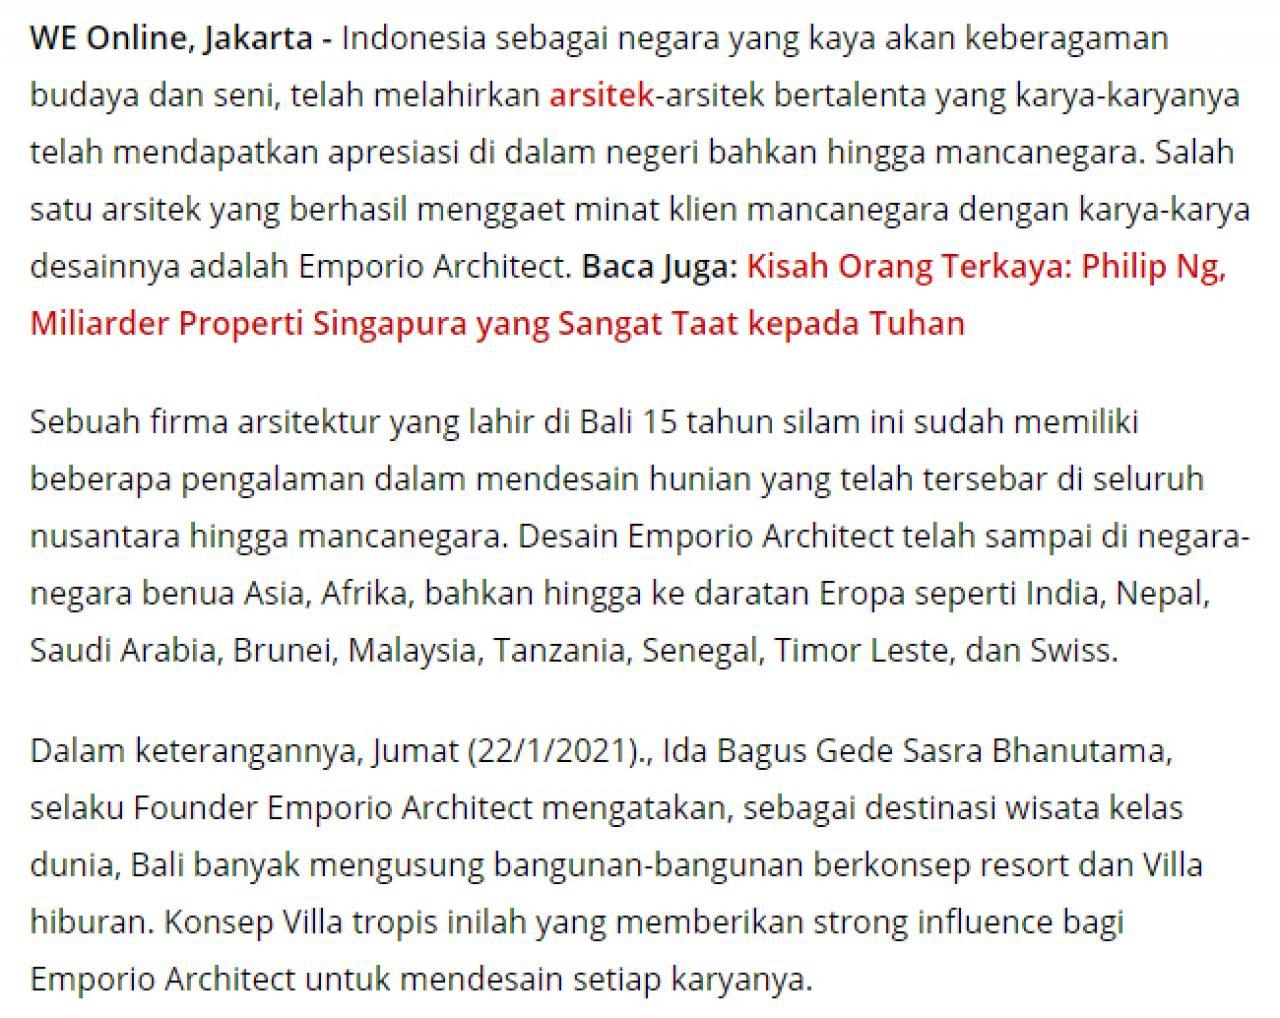 Ulasan Media WartaEkonomi.co.id - Moncer!! Emporio Architect Indonesia Tembus Pasar Internasional 1 1